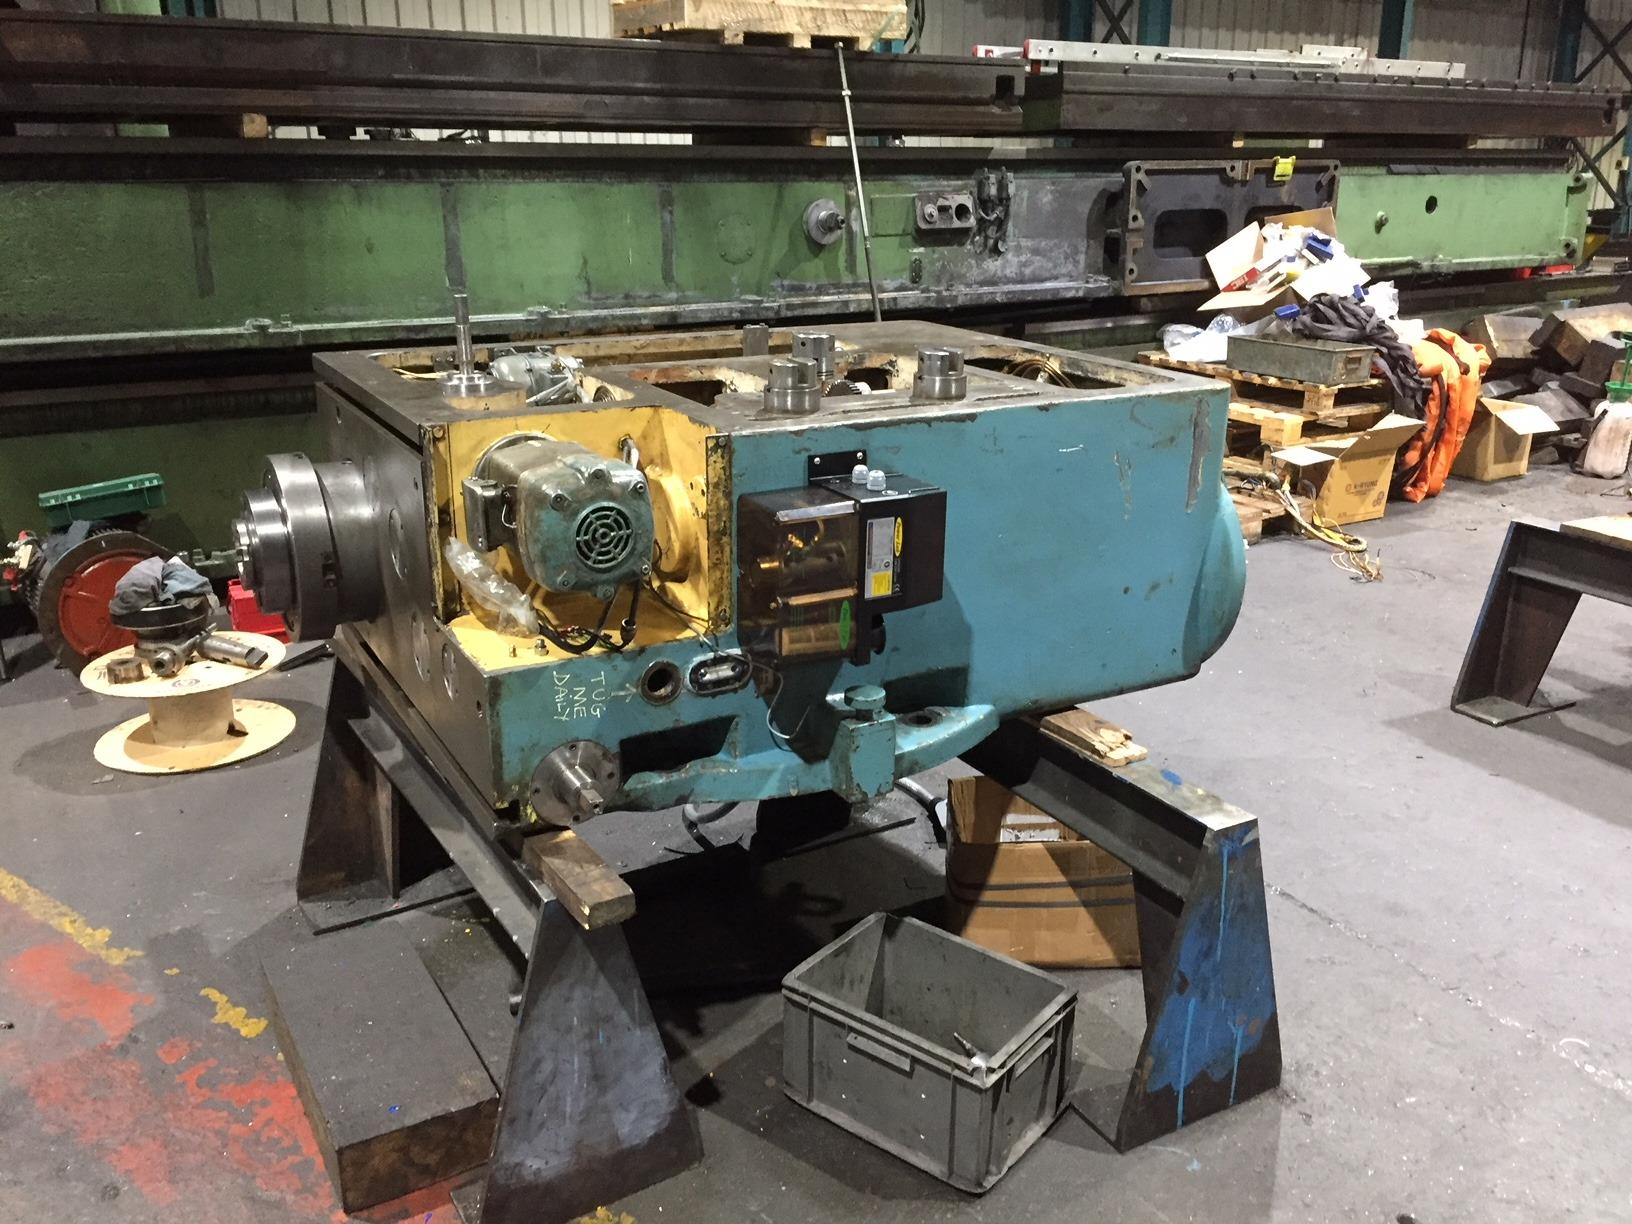 assembling a milling machine